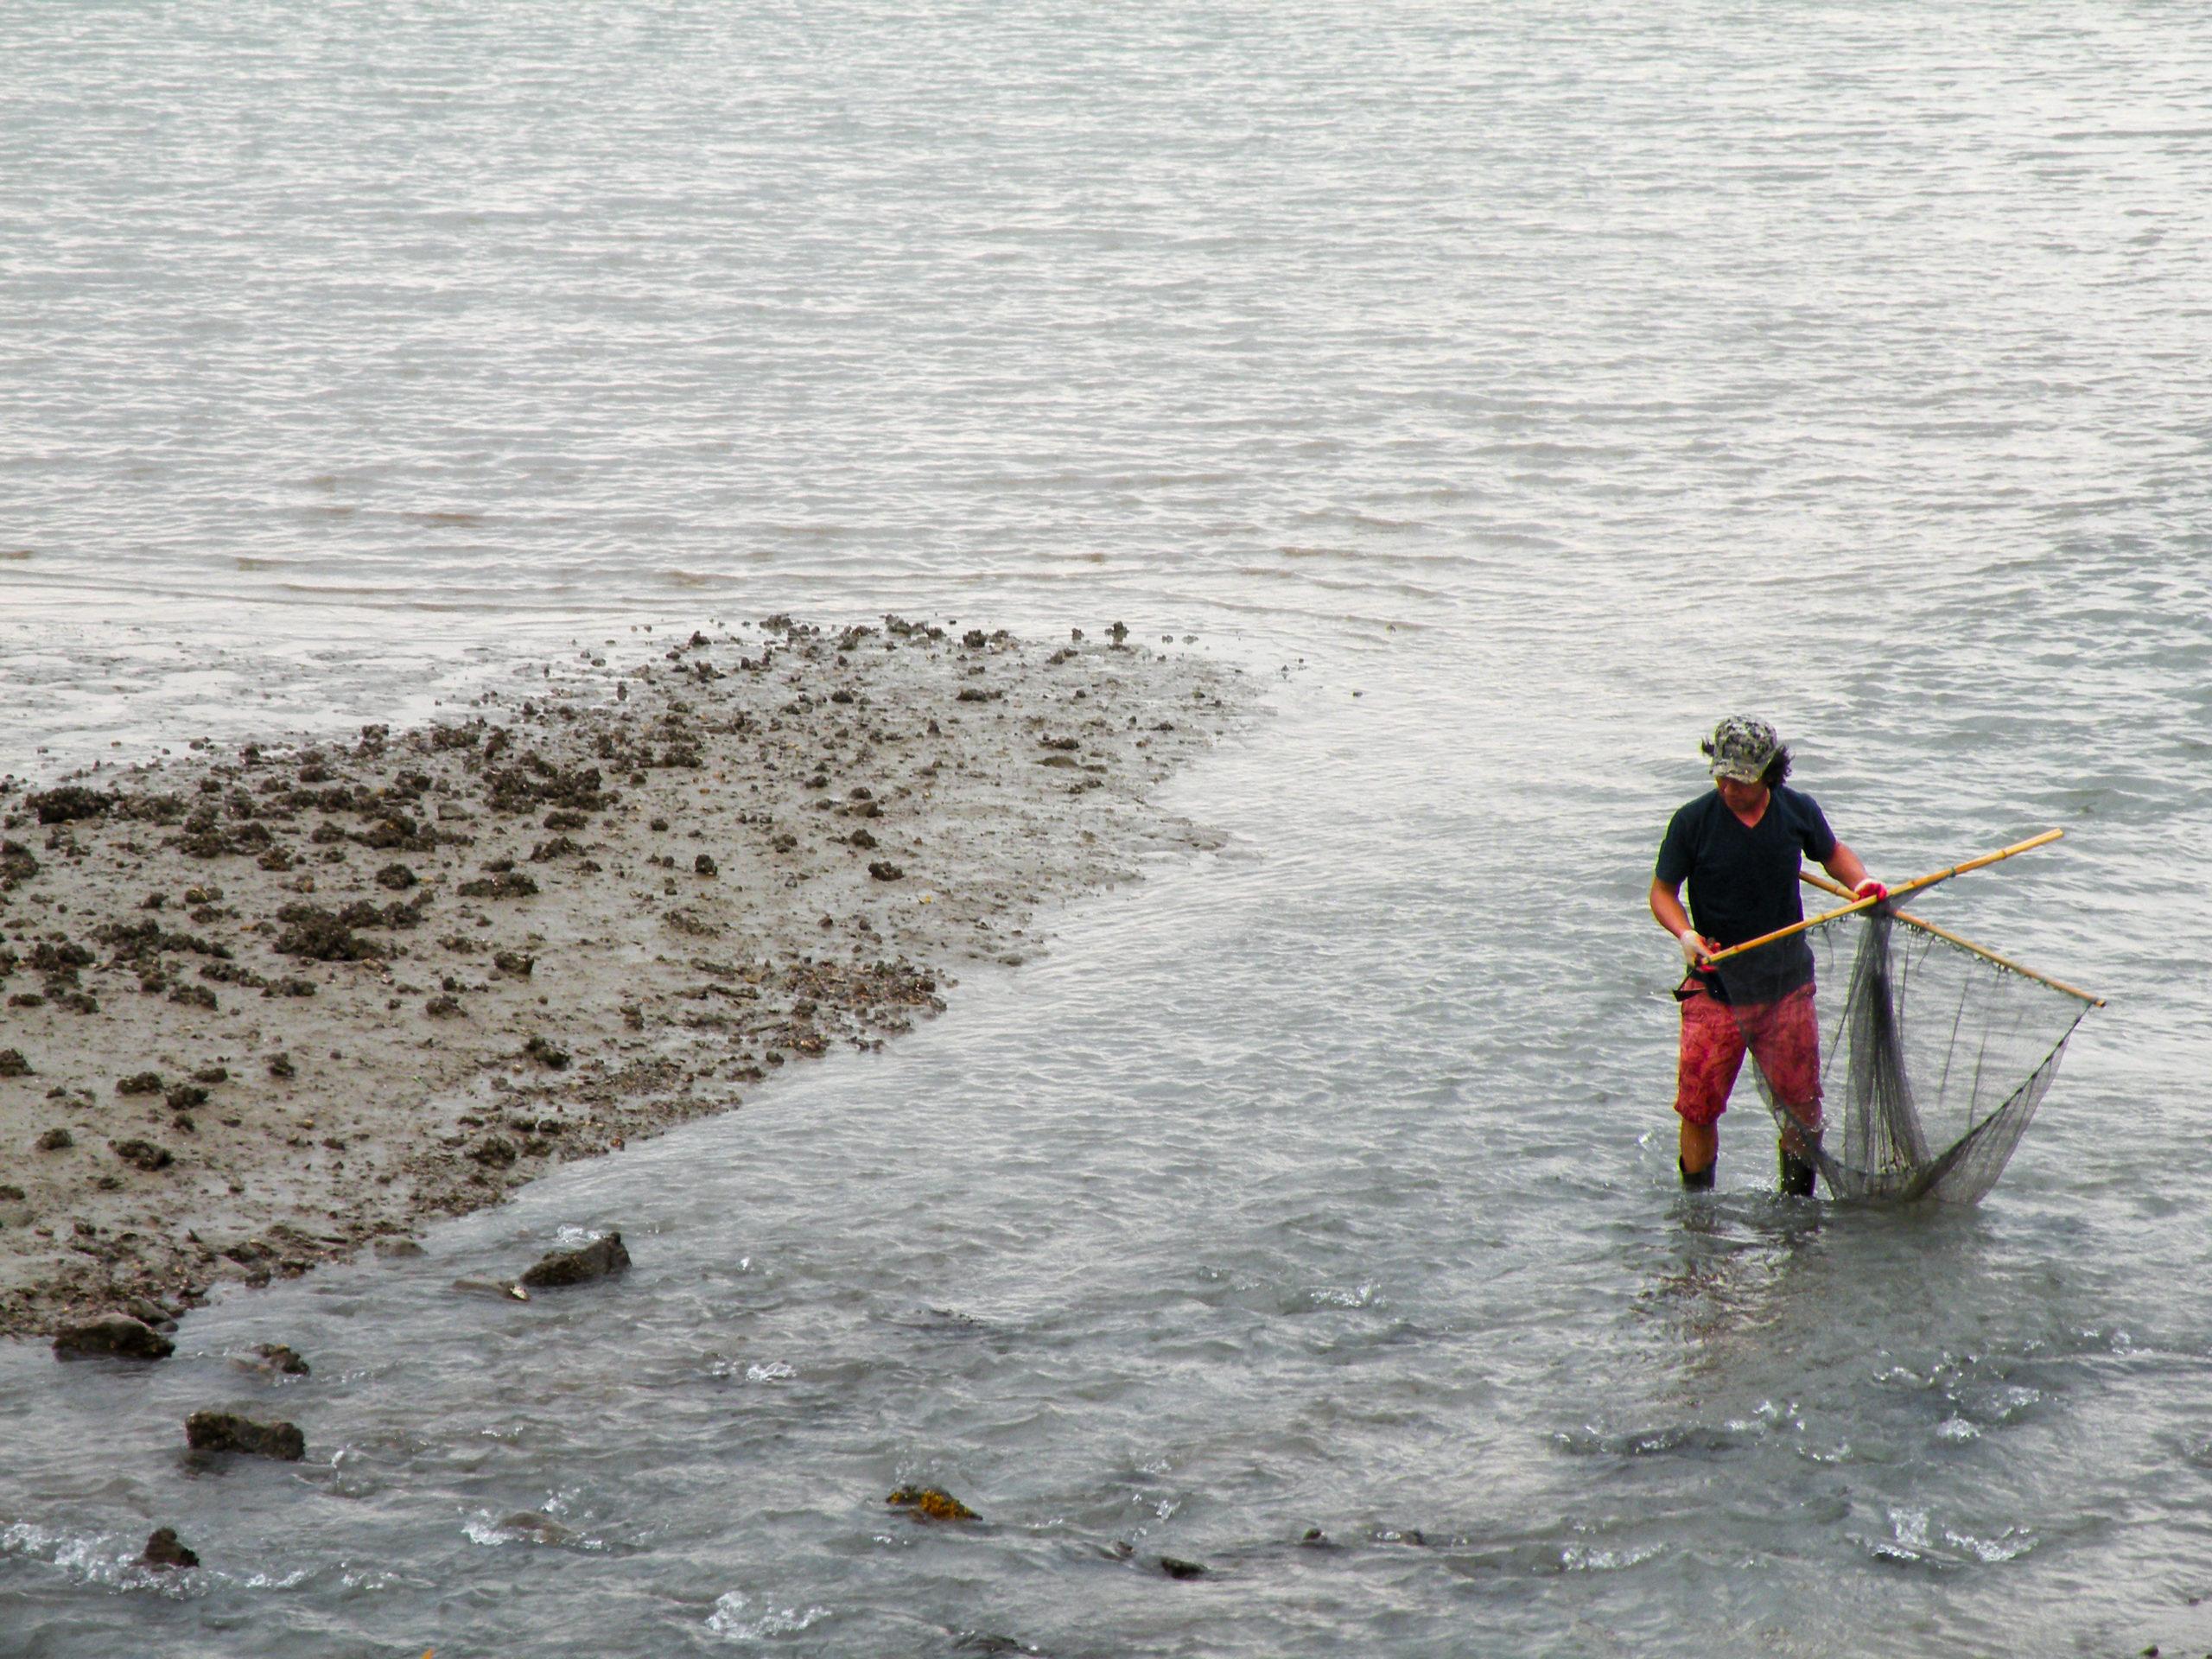 Korean man fishing on 가우도 (Ga-u-do)